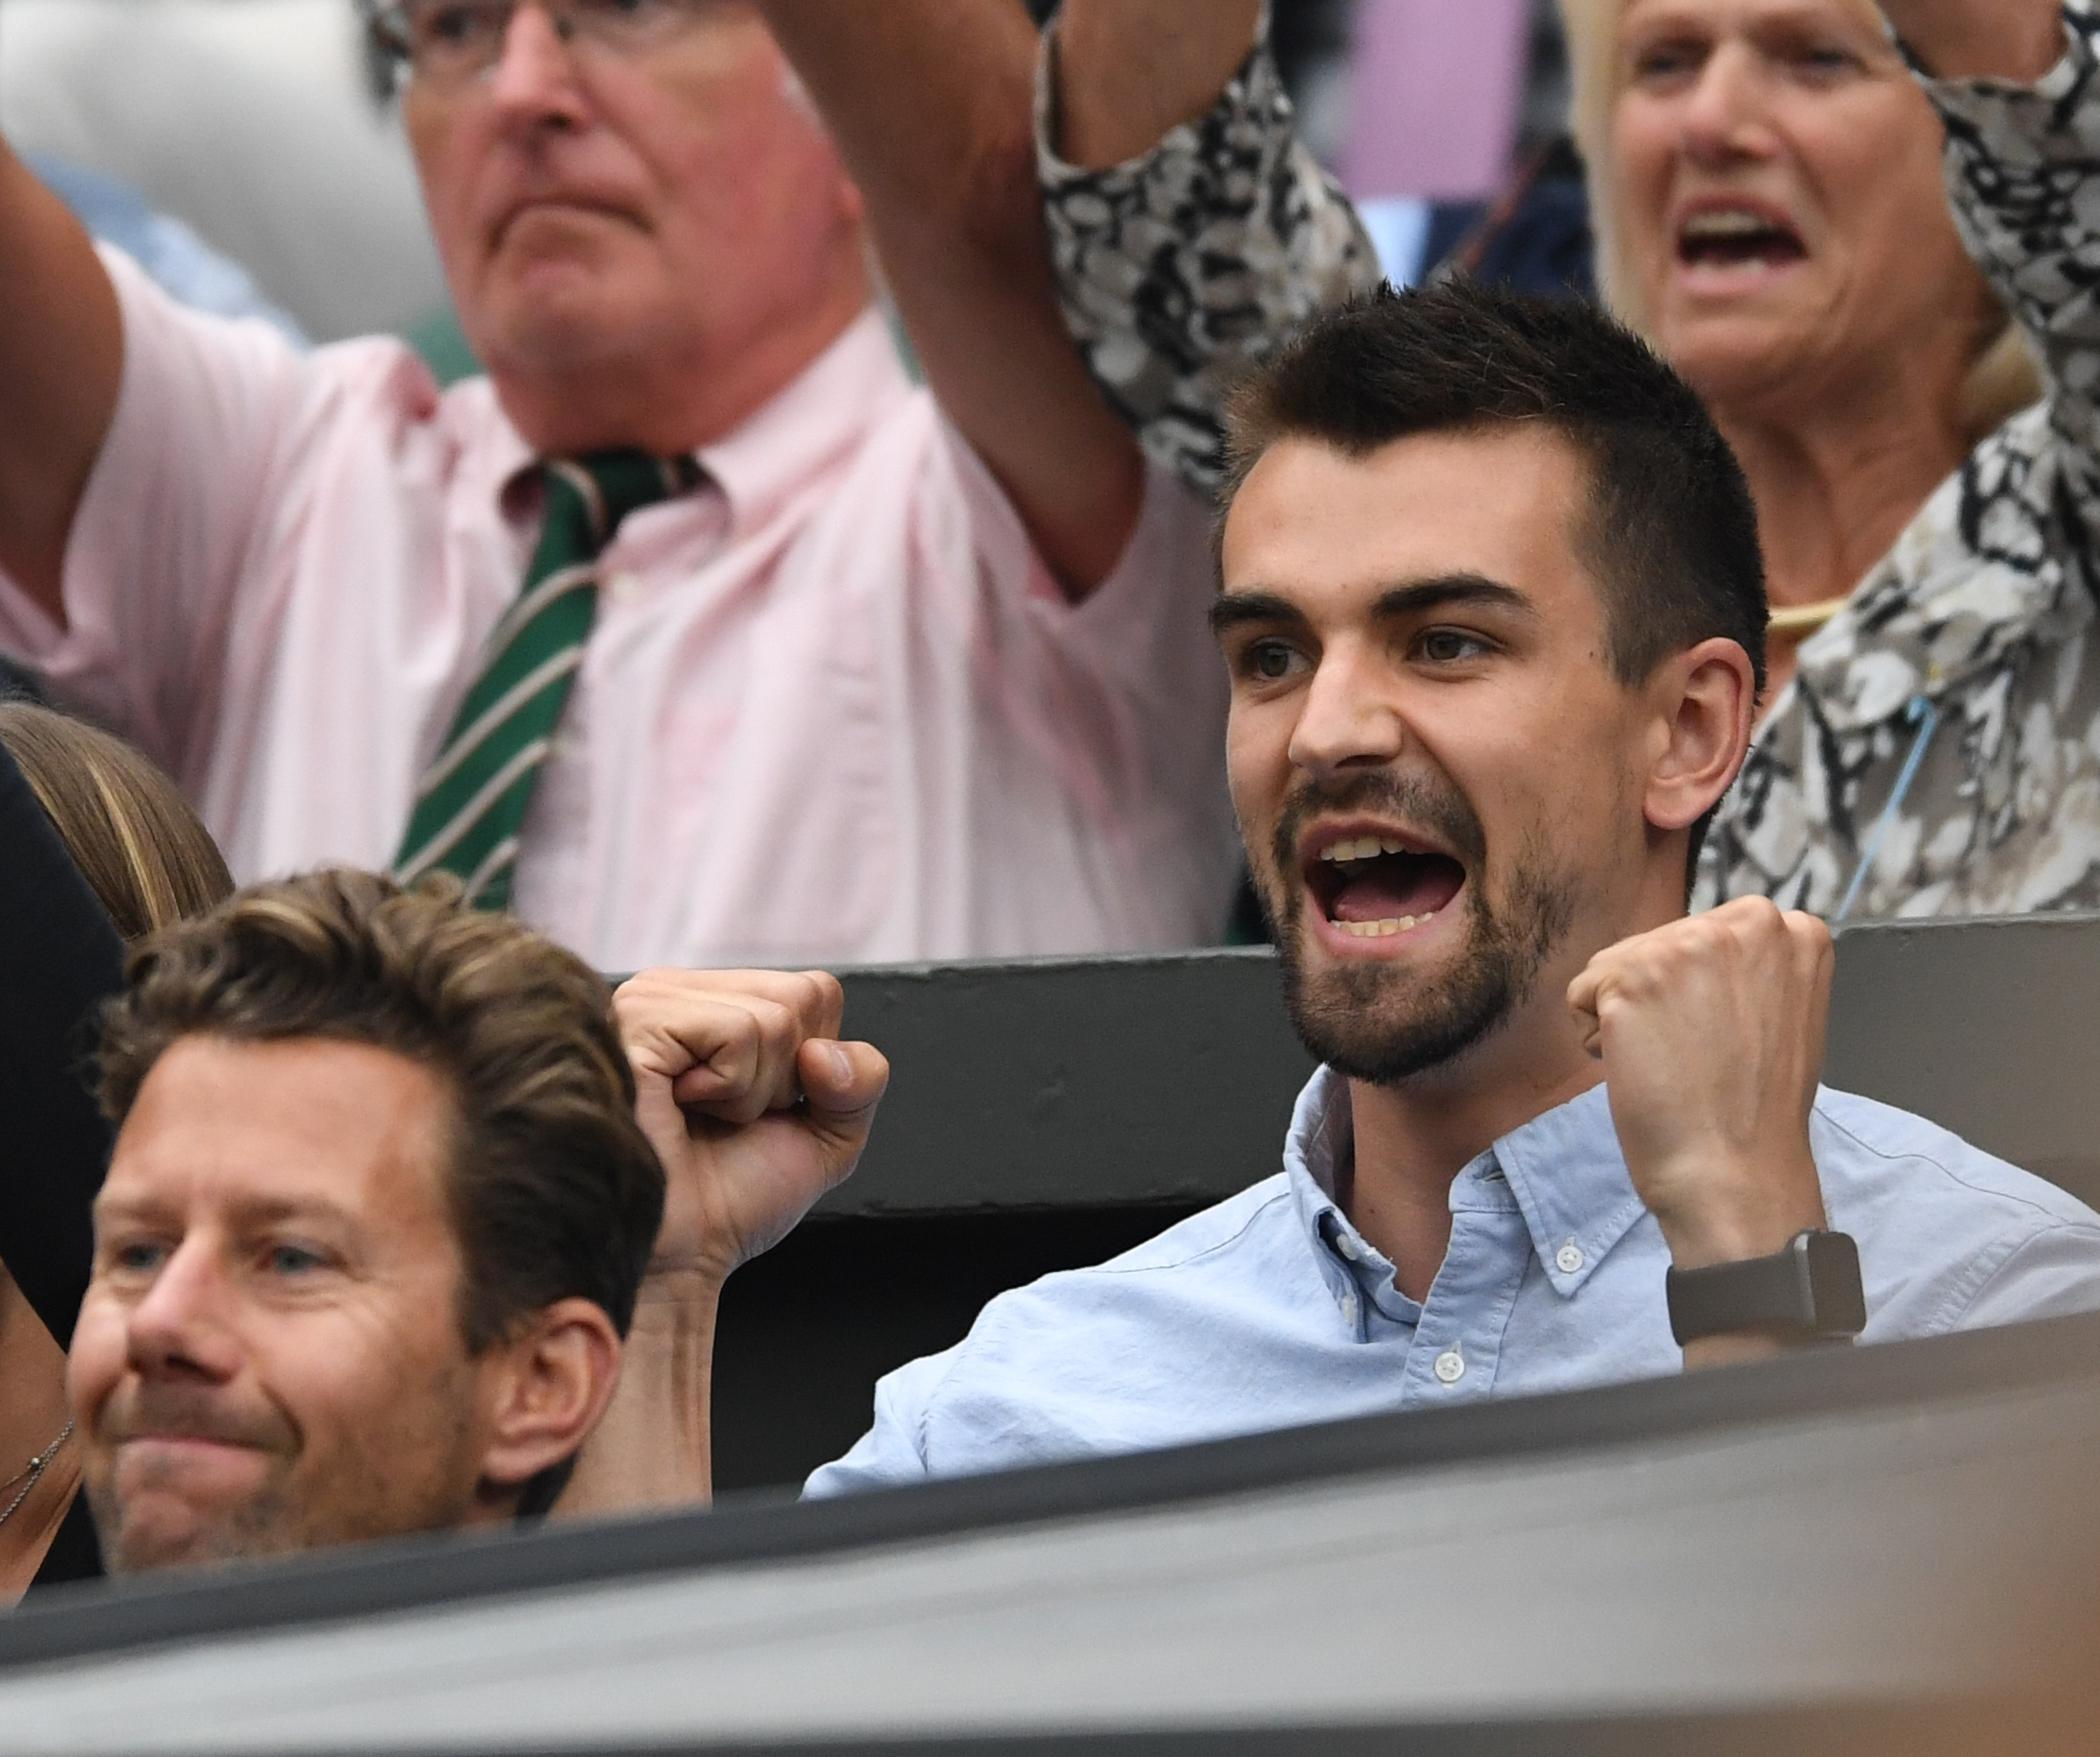 Jackson Wade cheers on his girlfriend against Simona Halep